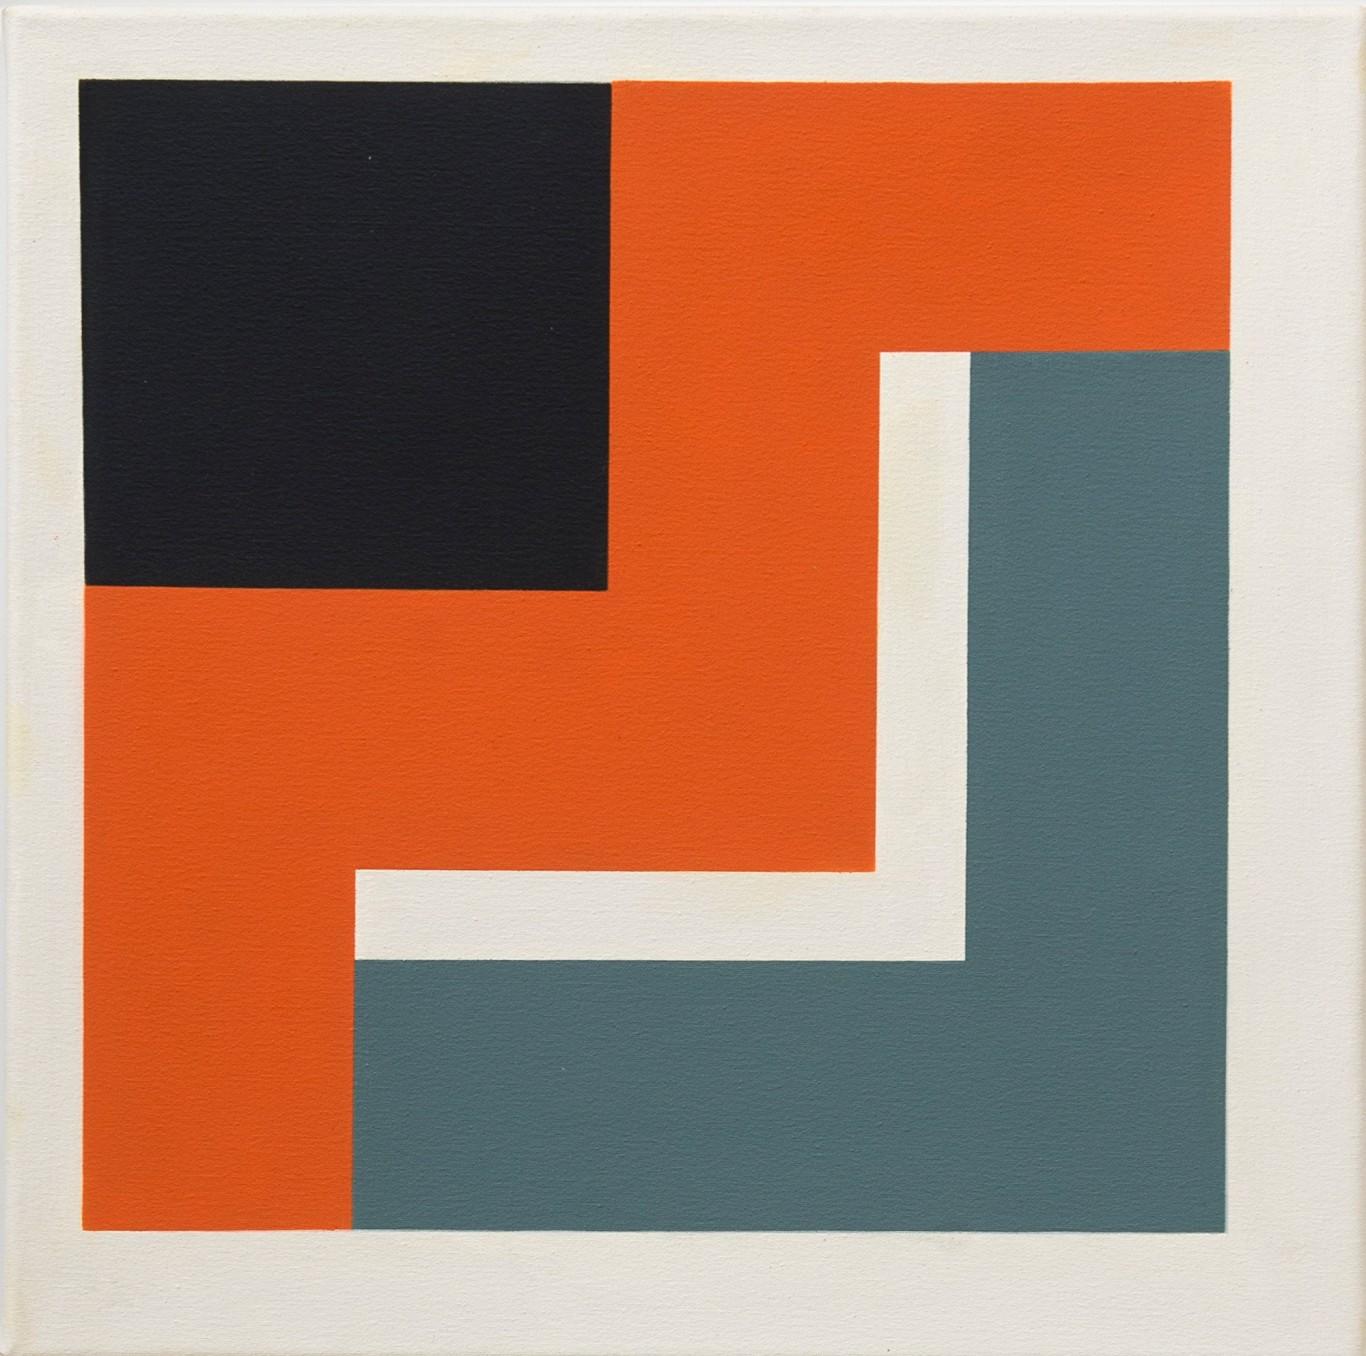 Mary Webb, UTAH VII, 2012, Oil on canvas, 45 x 45 cm, 17 3/4 x 17 3/4 in, Framed: 54.5 x 54.5 x 4 cm, 21 1/2 x 21 1/2 x 1 5/8 in